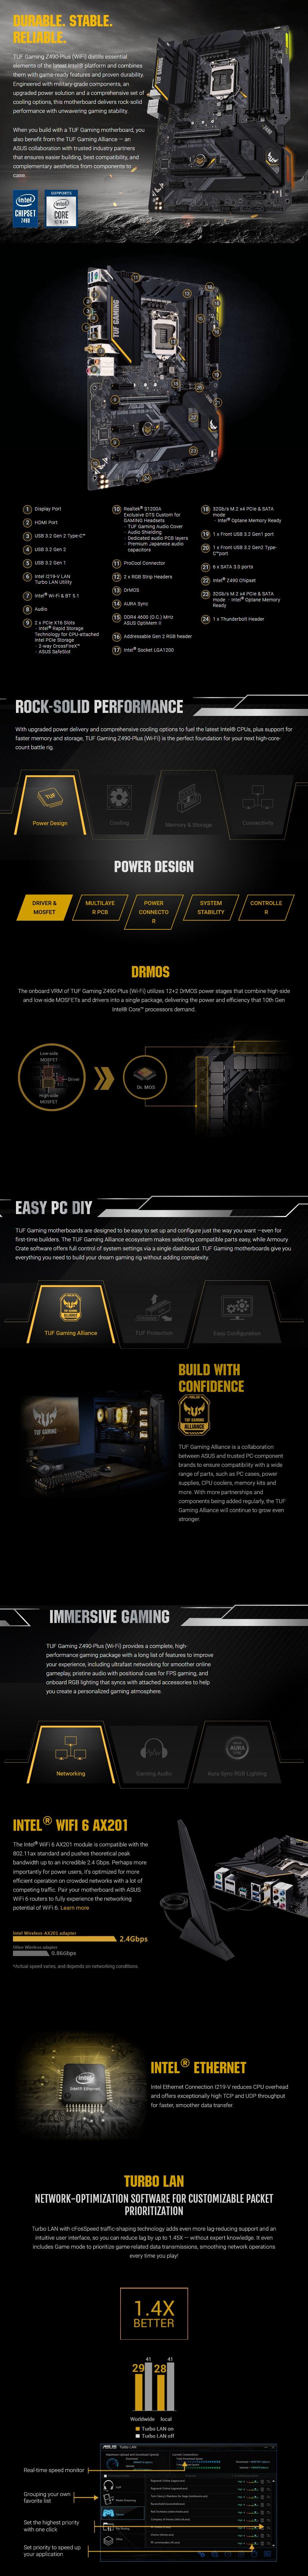 ASUS TUF GAMING Z490-PLUS WI-FI LGA 1200 ATX Motherboard - Overview 1